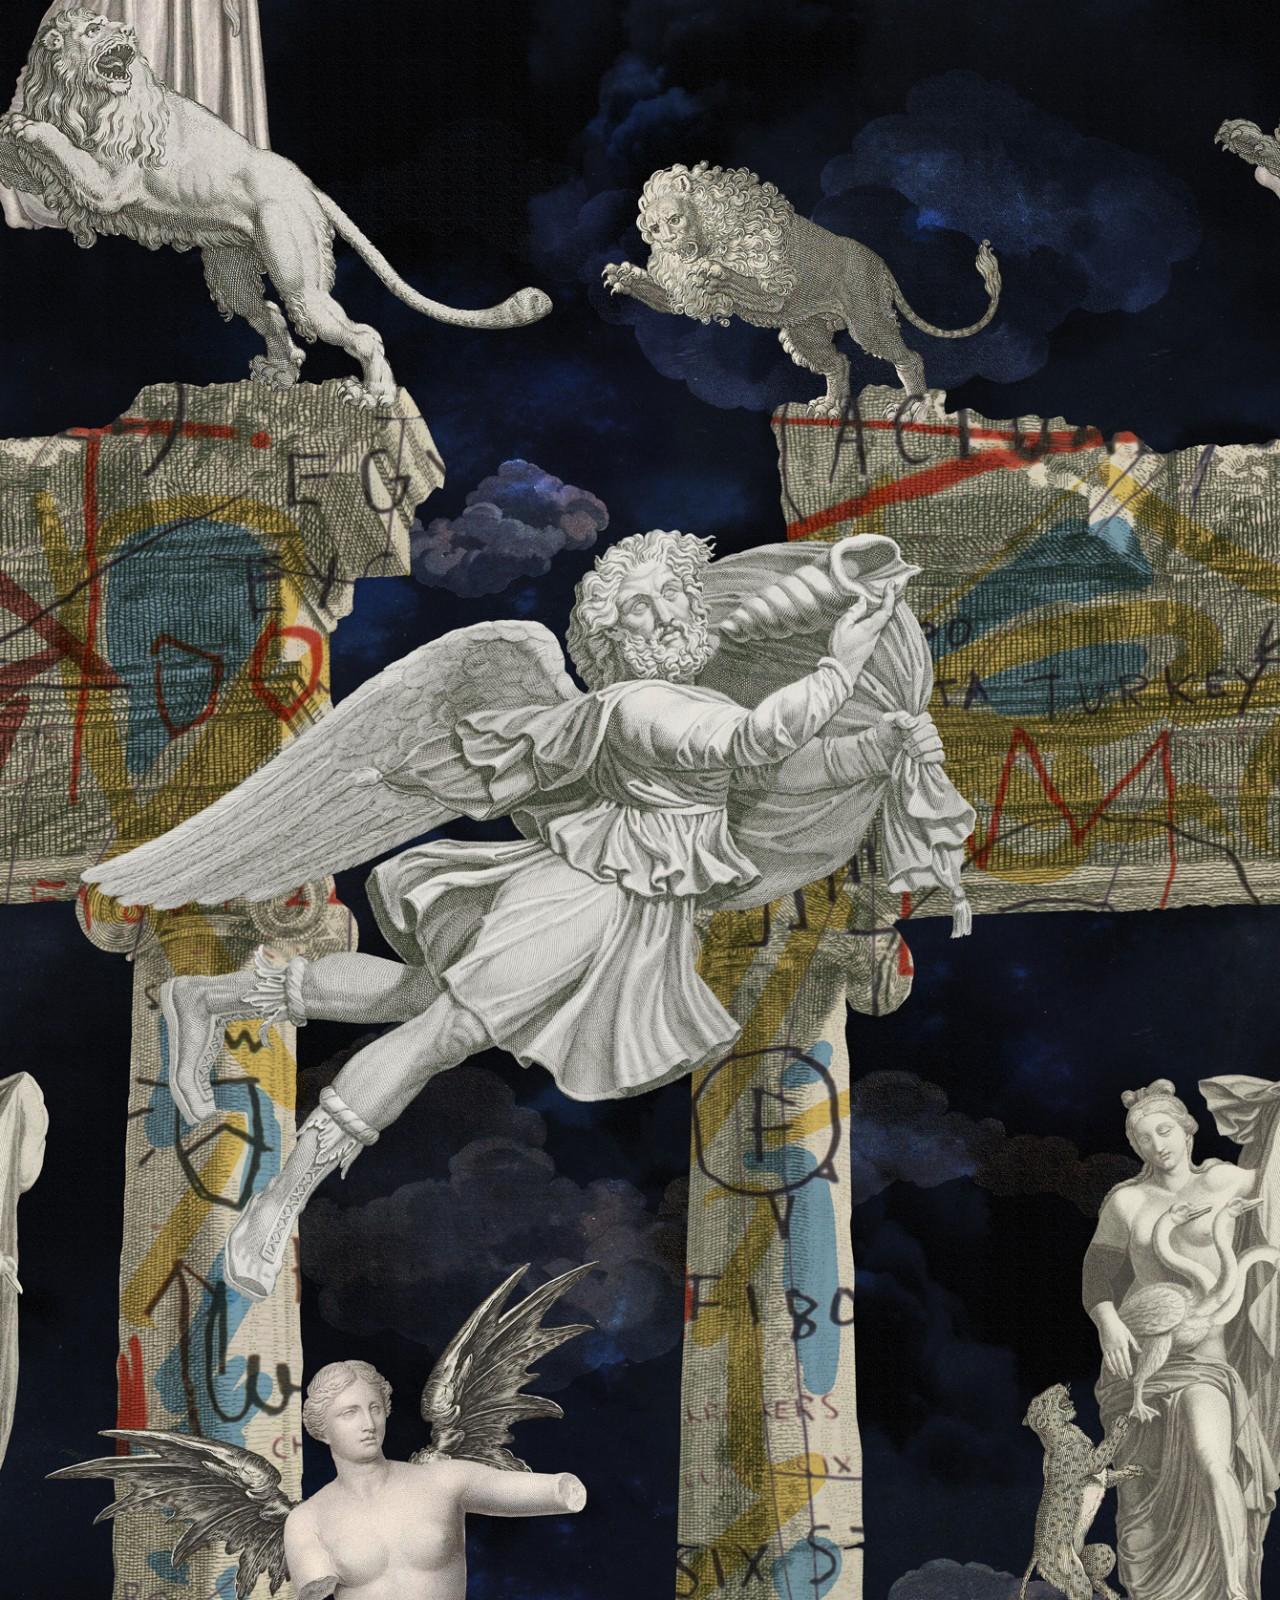 TALES Of MYTHOLOGY Wallpaper